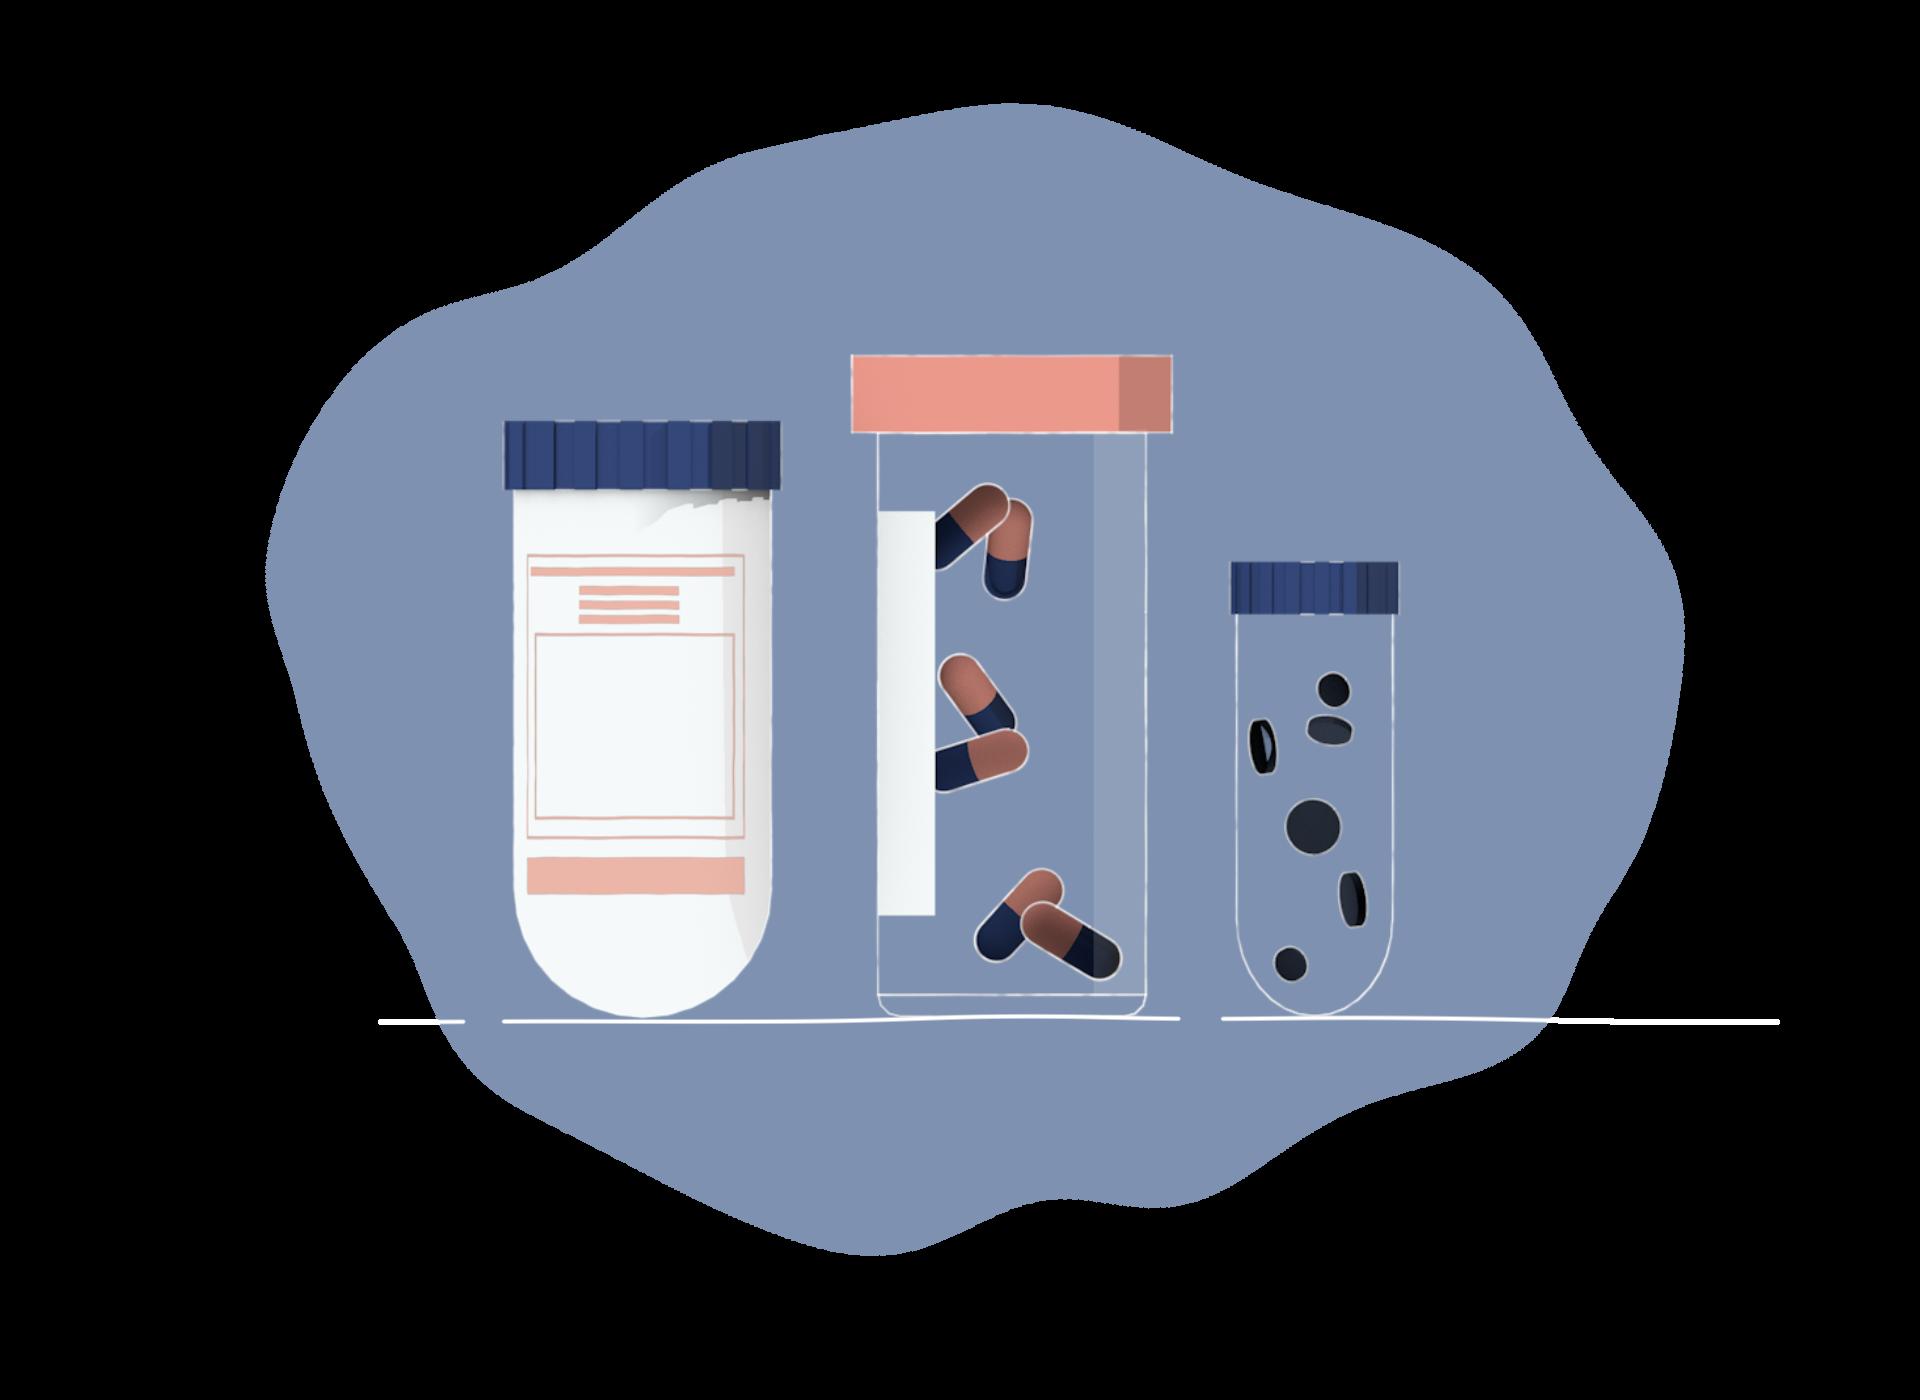 hypothyroidism medication prescription